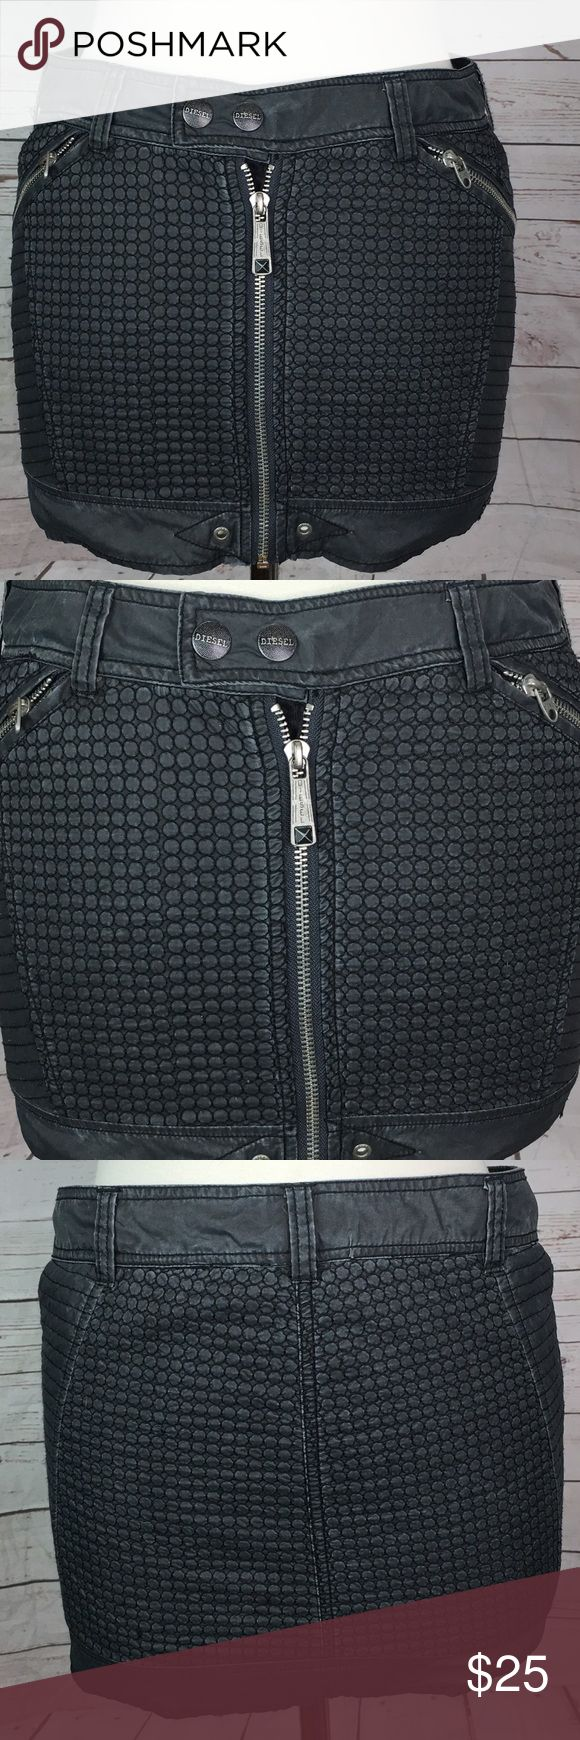 "Diesel Women's Dark Grey  zip Mini Skirt Size 25 Cute Women's Diesel quilted nylon mini skirt zipper details size 25.  Measurements: 15"" waist 12"" length 17"" hips Diesel Skirts Mini"